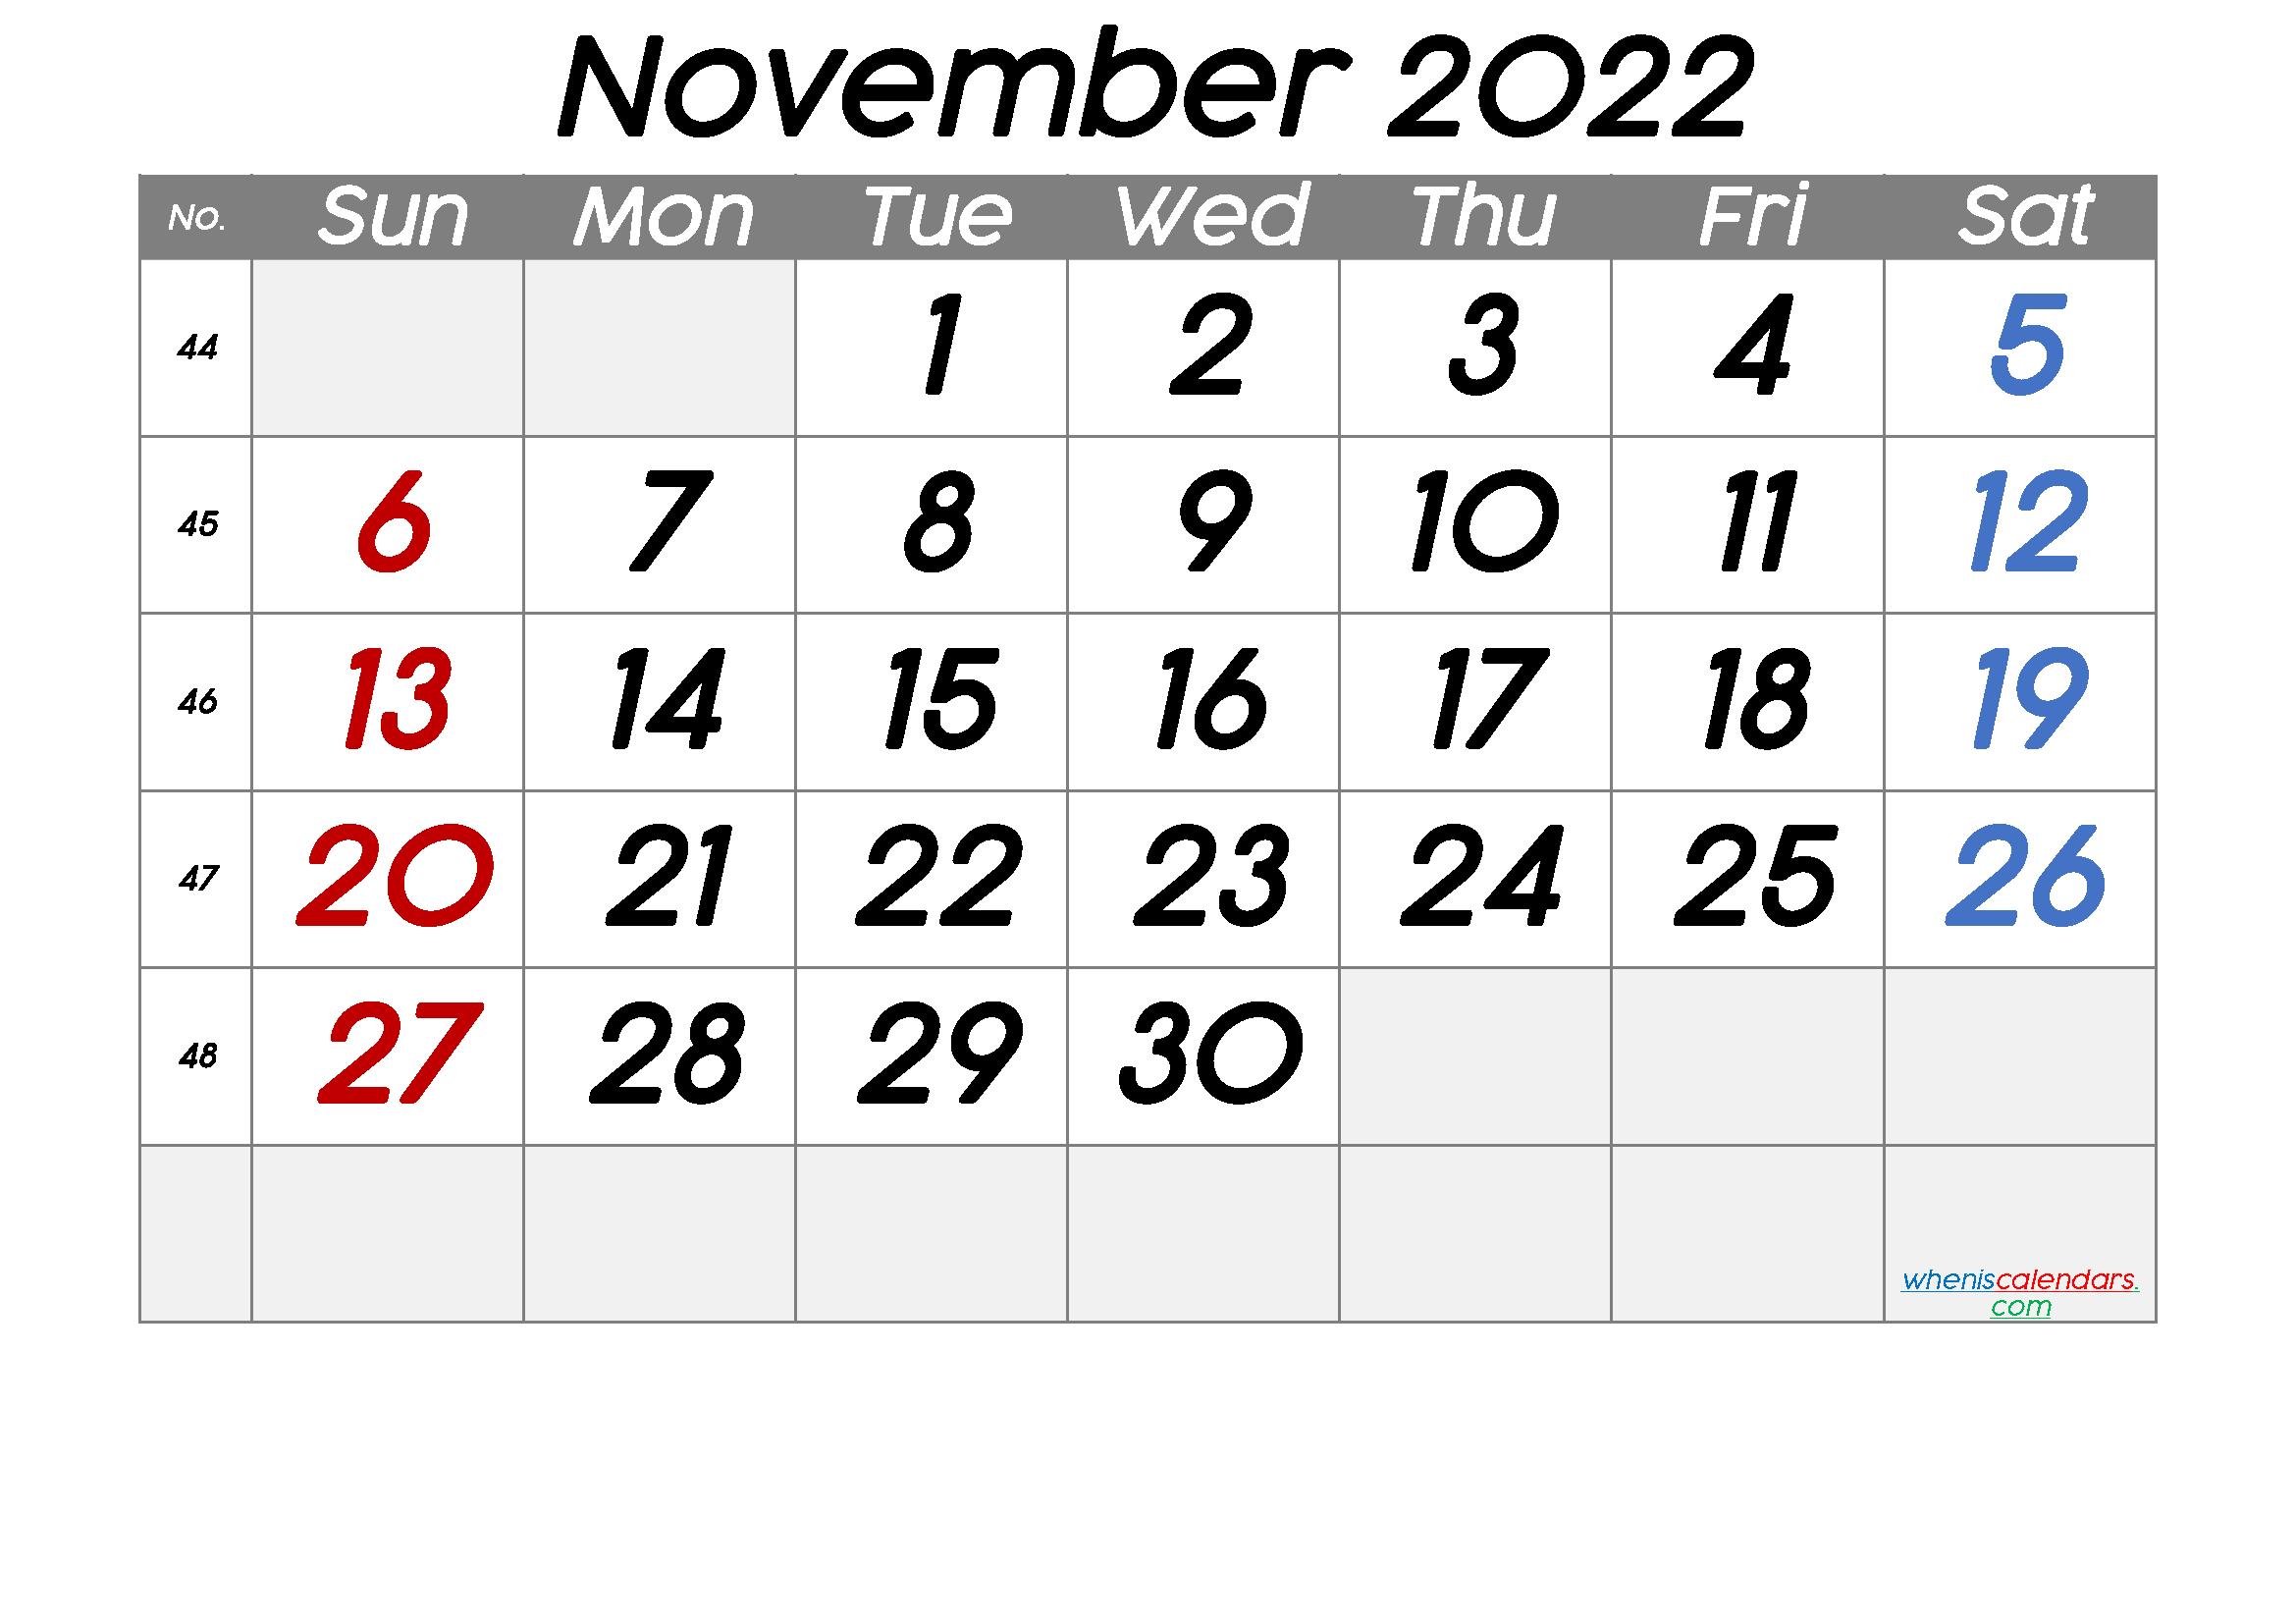 Free Printable November 2022 Calendar With Week Numbers regarding November 2022 Calendar Planner Printable Photo